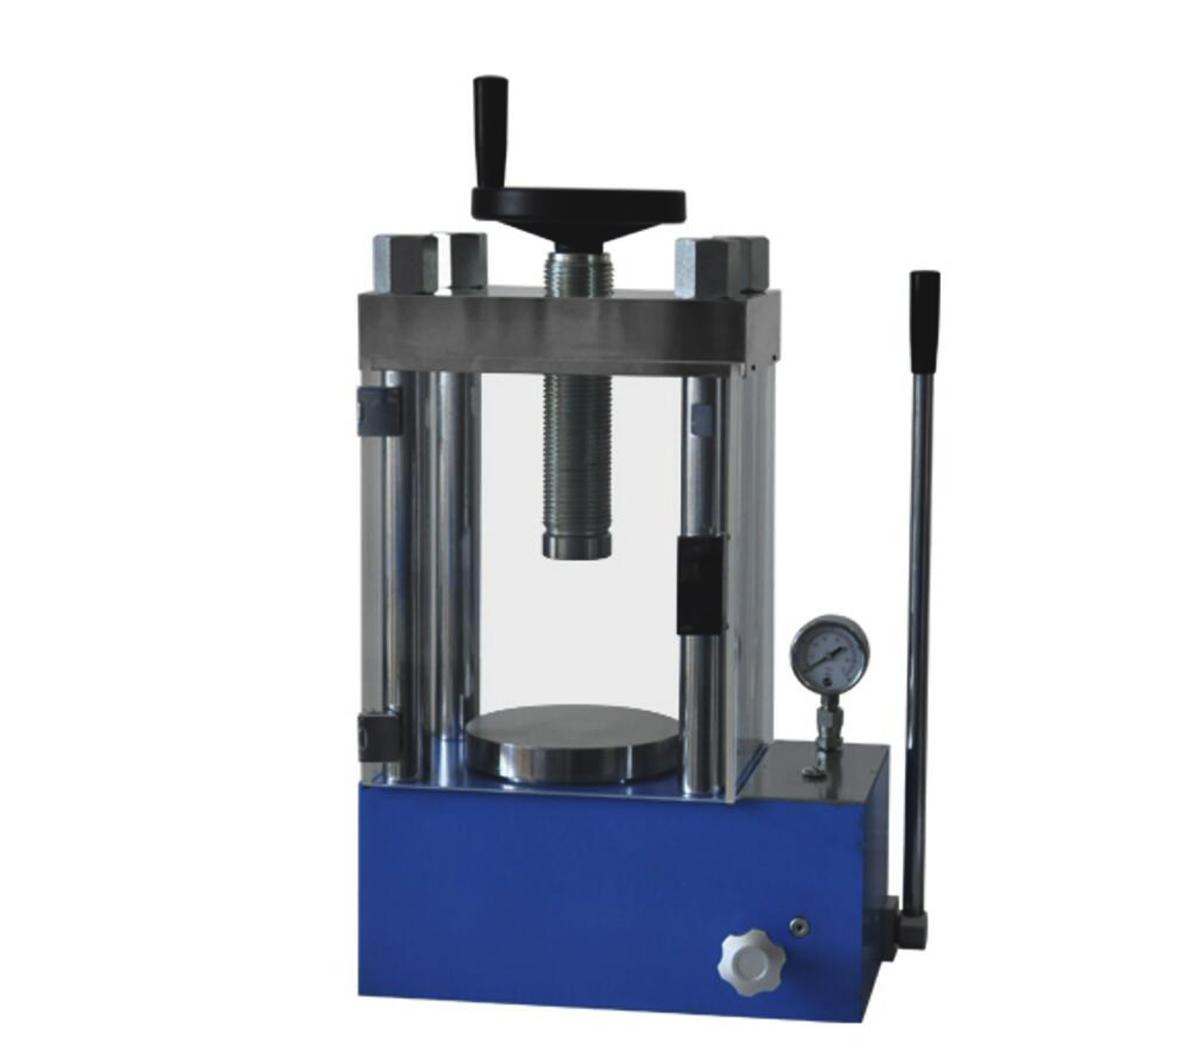 60T Laboratory Manual Hydraulic Press with PMMA Cover CY-PC-60F